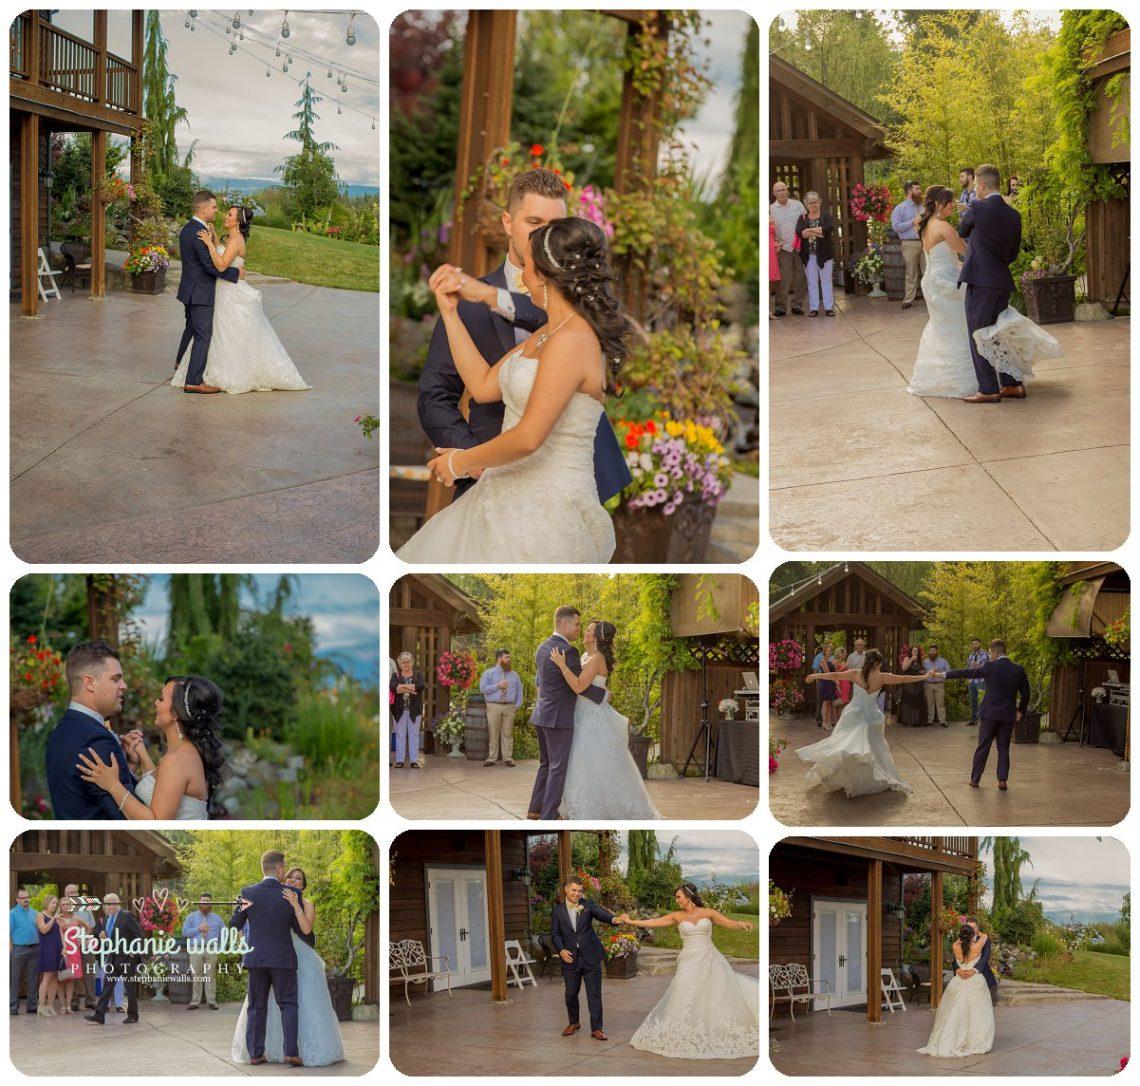 2016 11 29 0021 This Day Forward   Wild Rose Weddings Arlington, Washington